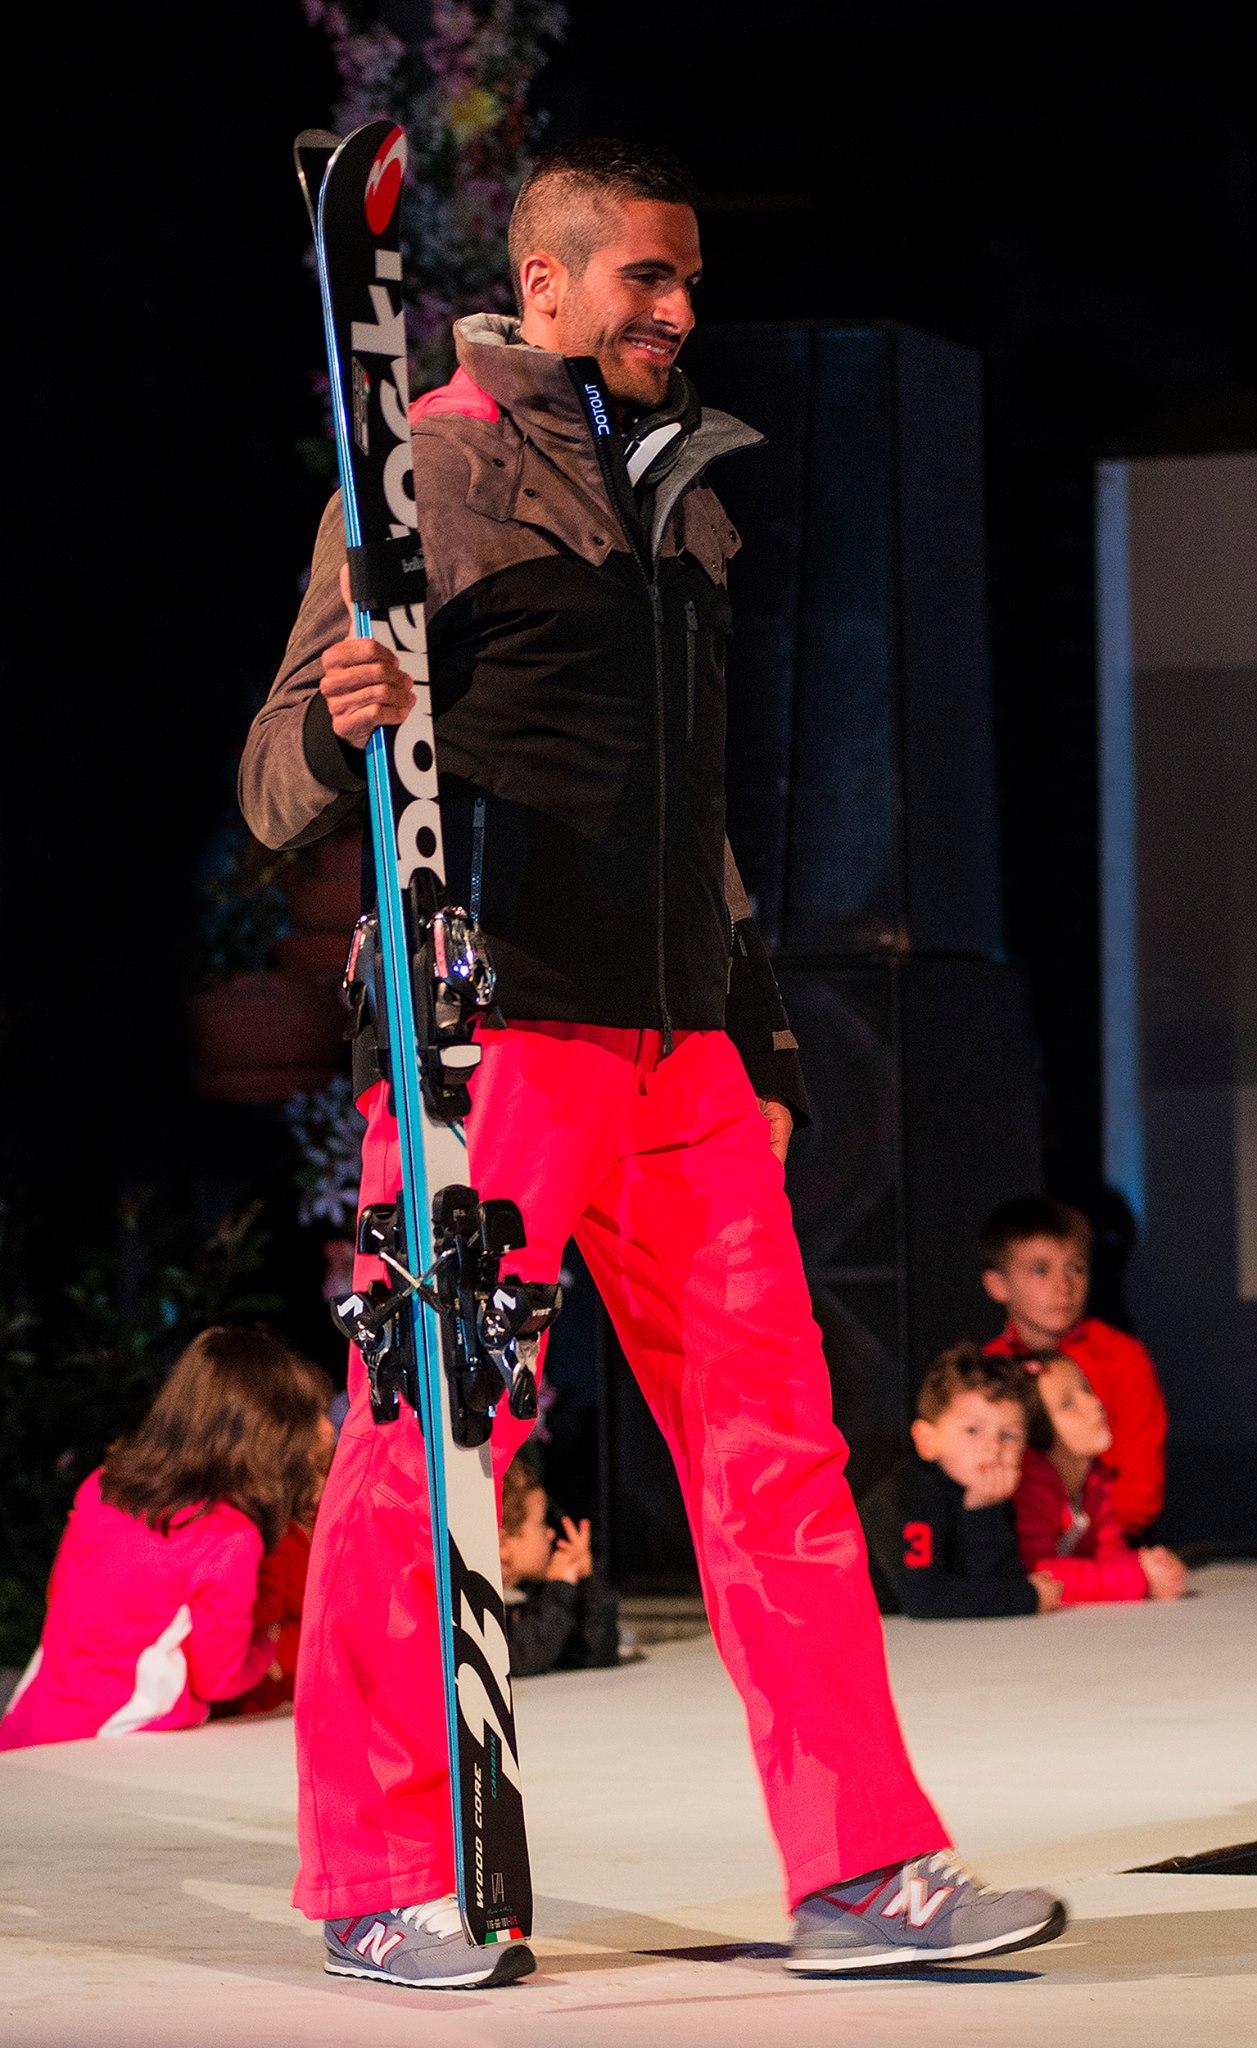 sfilata botteroski vernante 2016 sci inverno 2017 botteroski